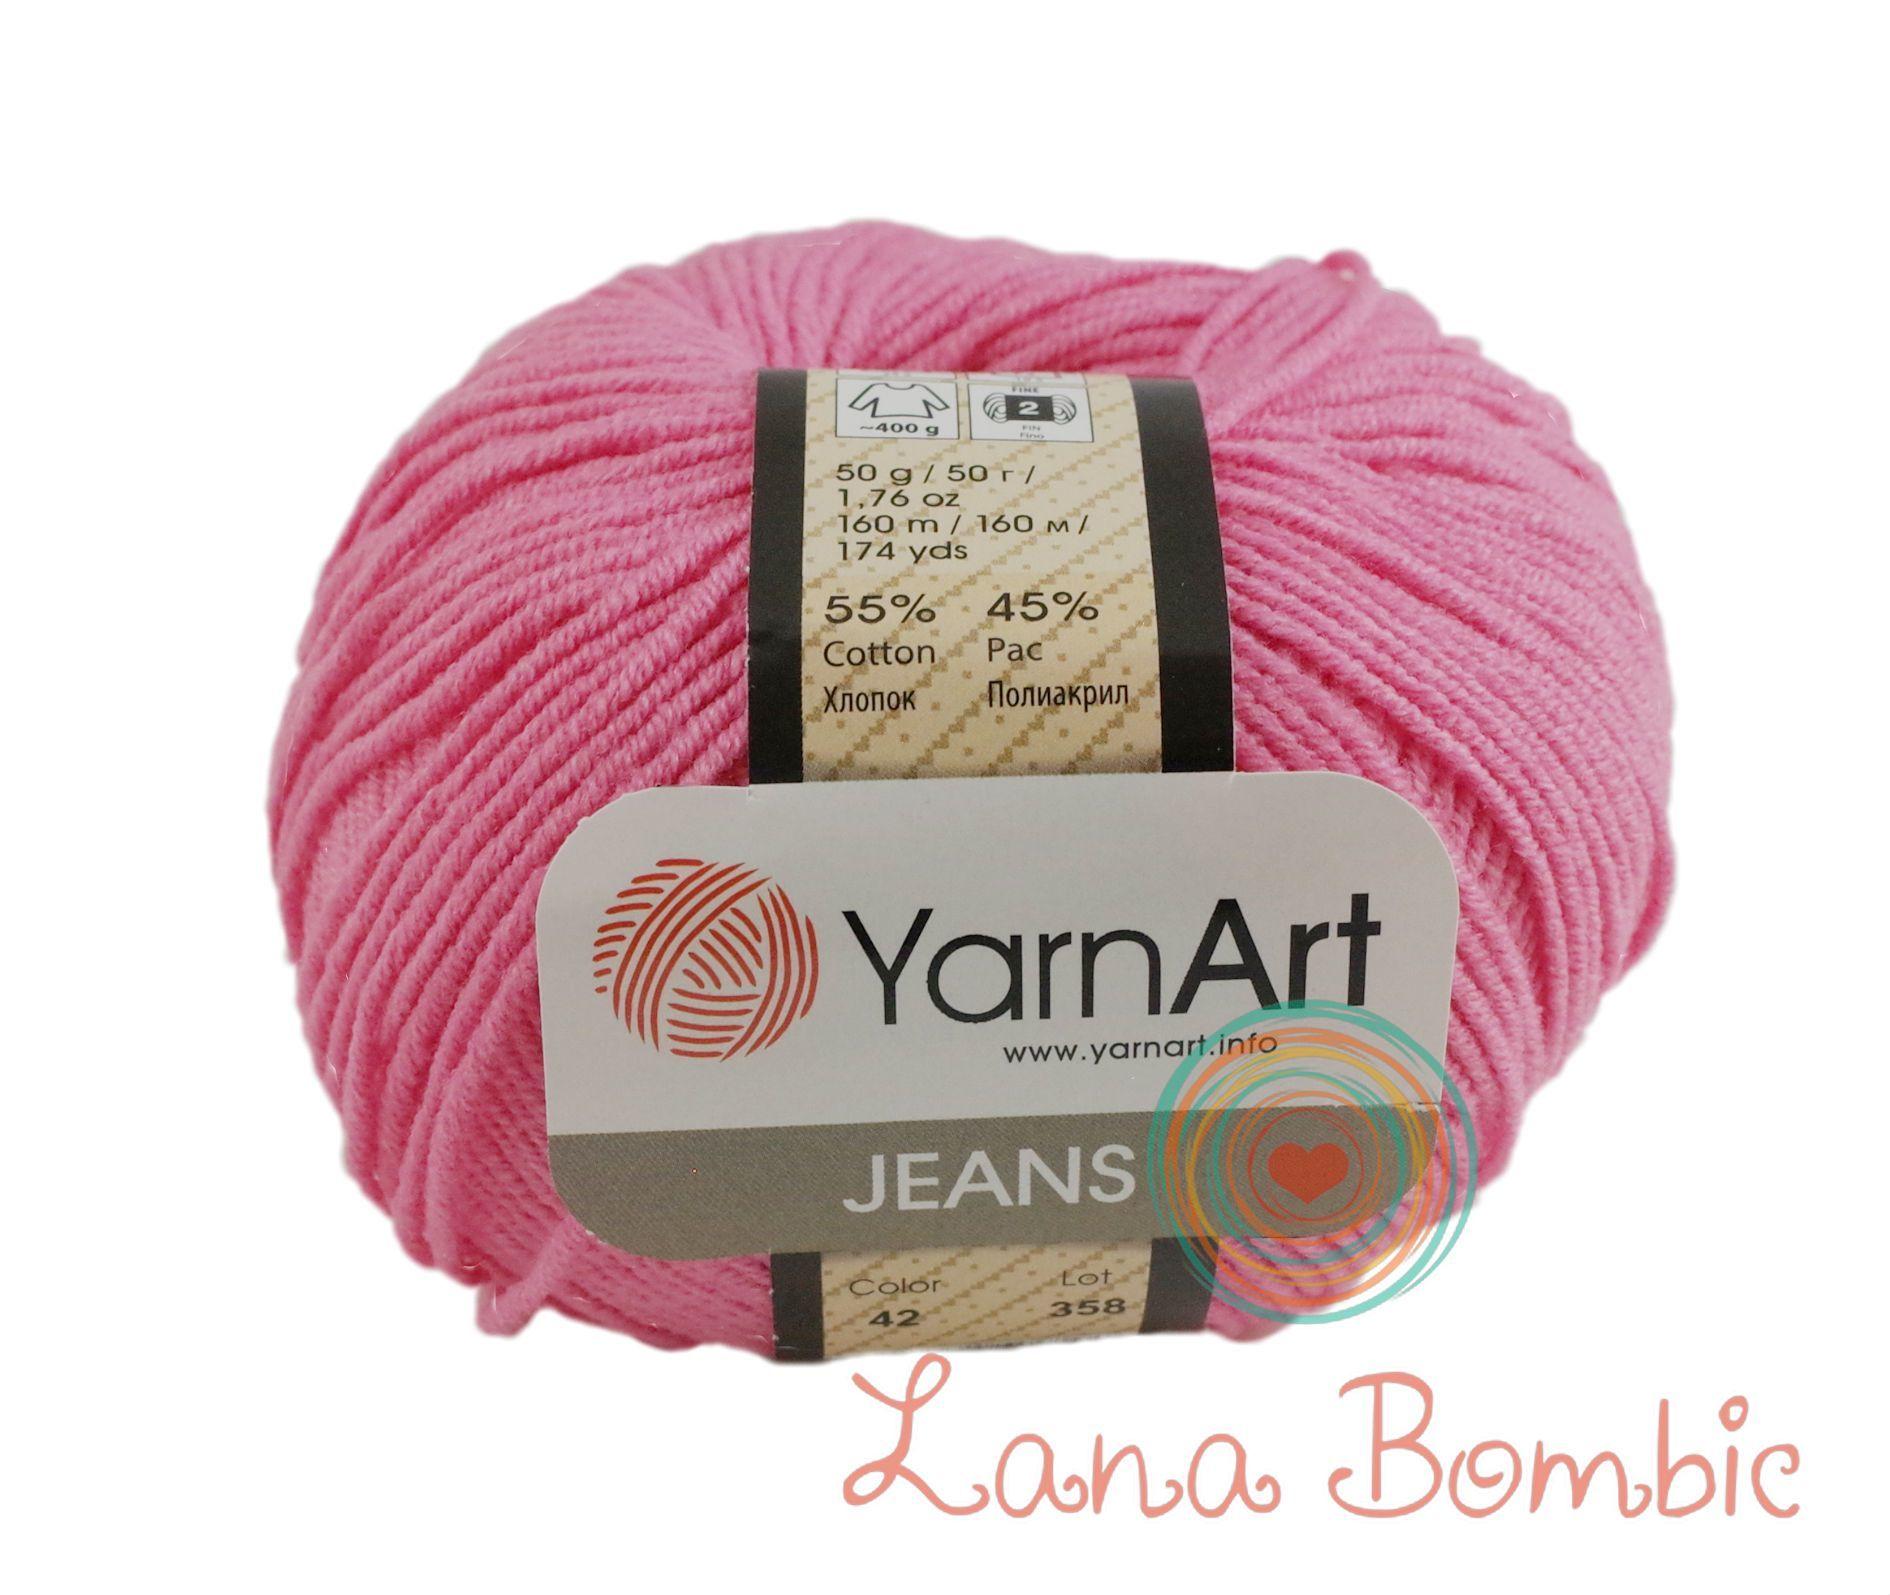 Пряжа YarnArt Jeans 42 ярко-розовый